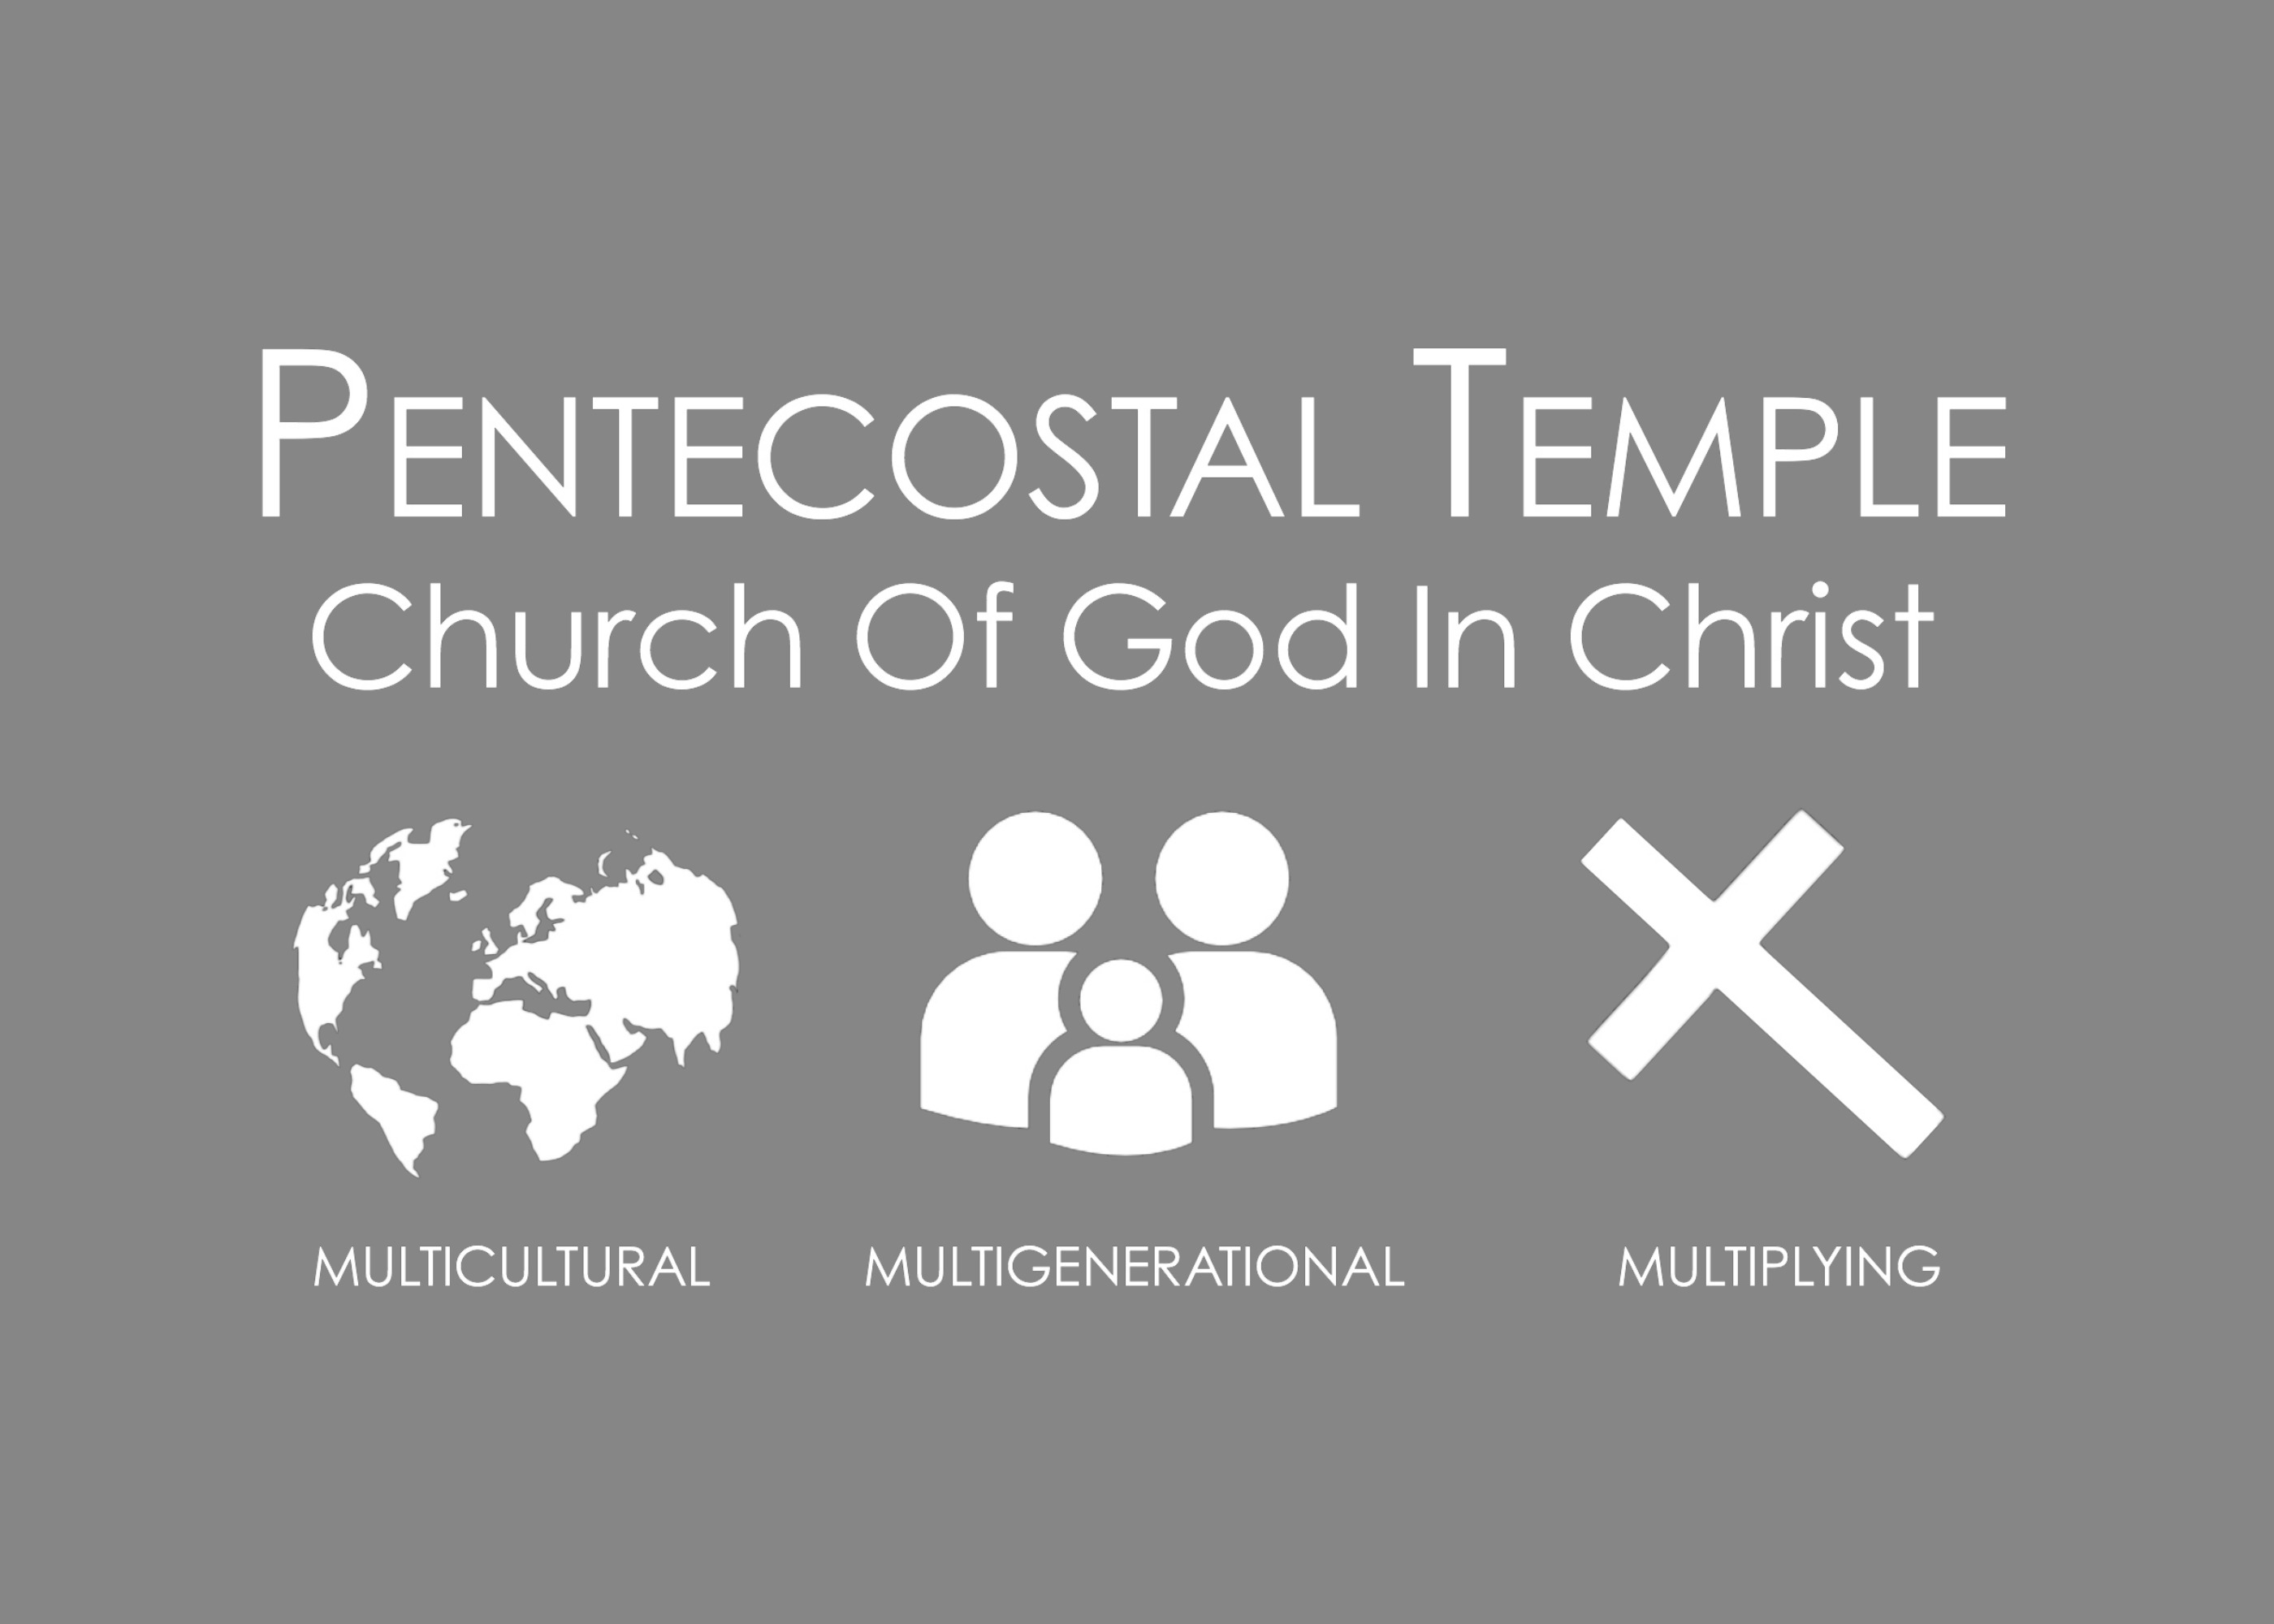 Pentecostal Temple Gray Flyer back